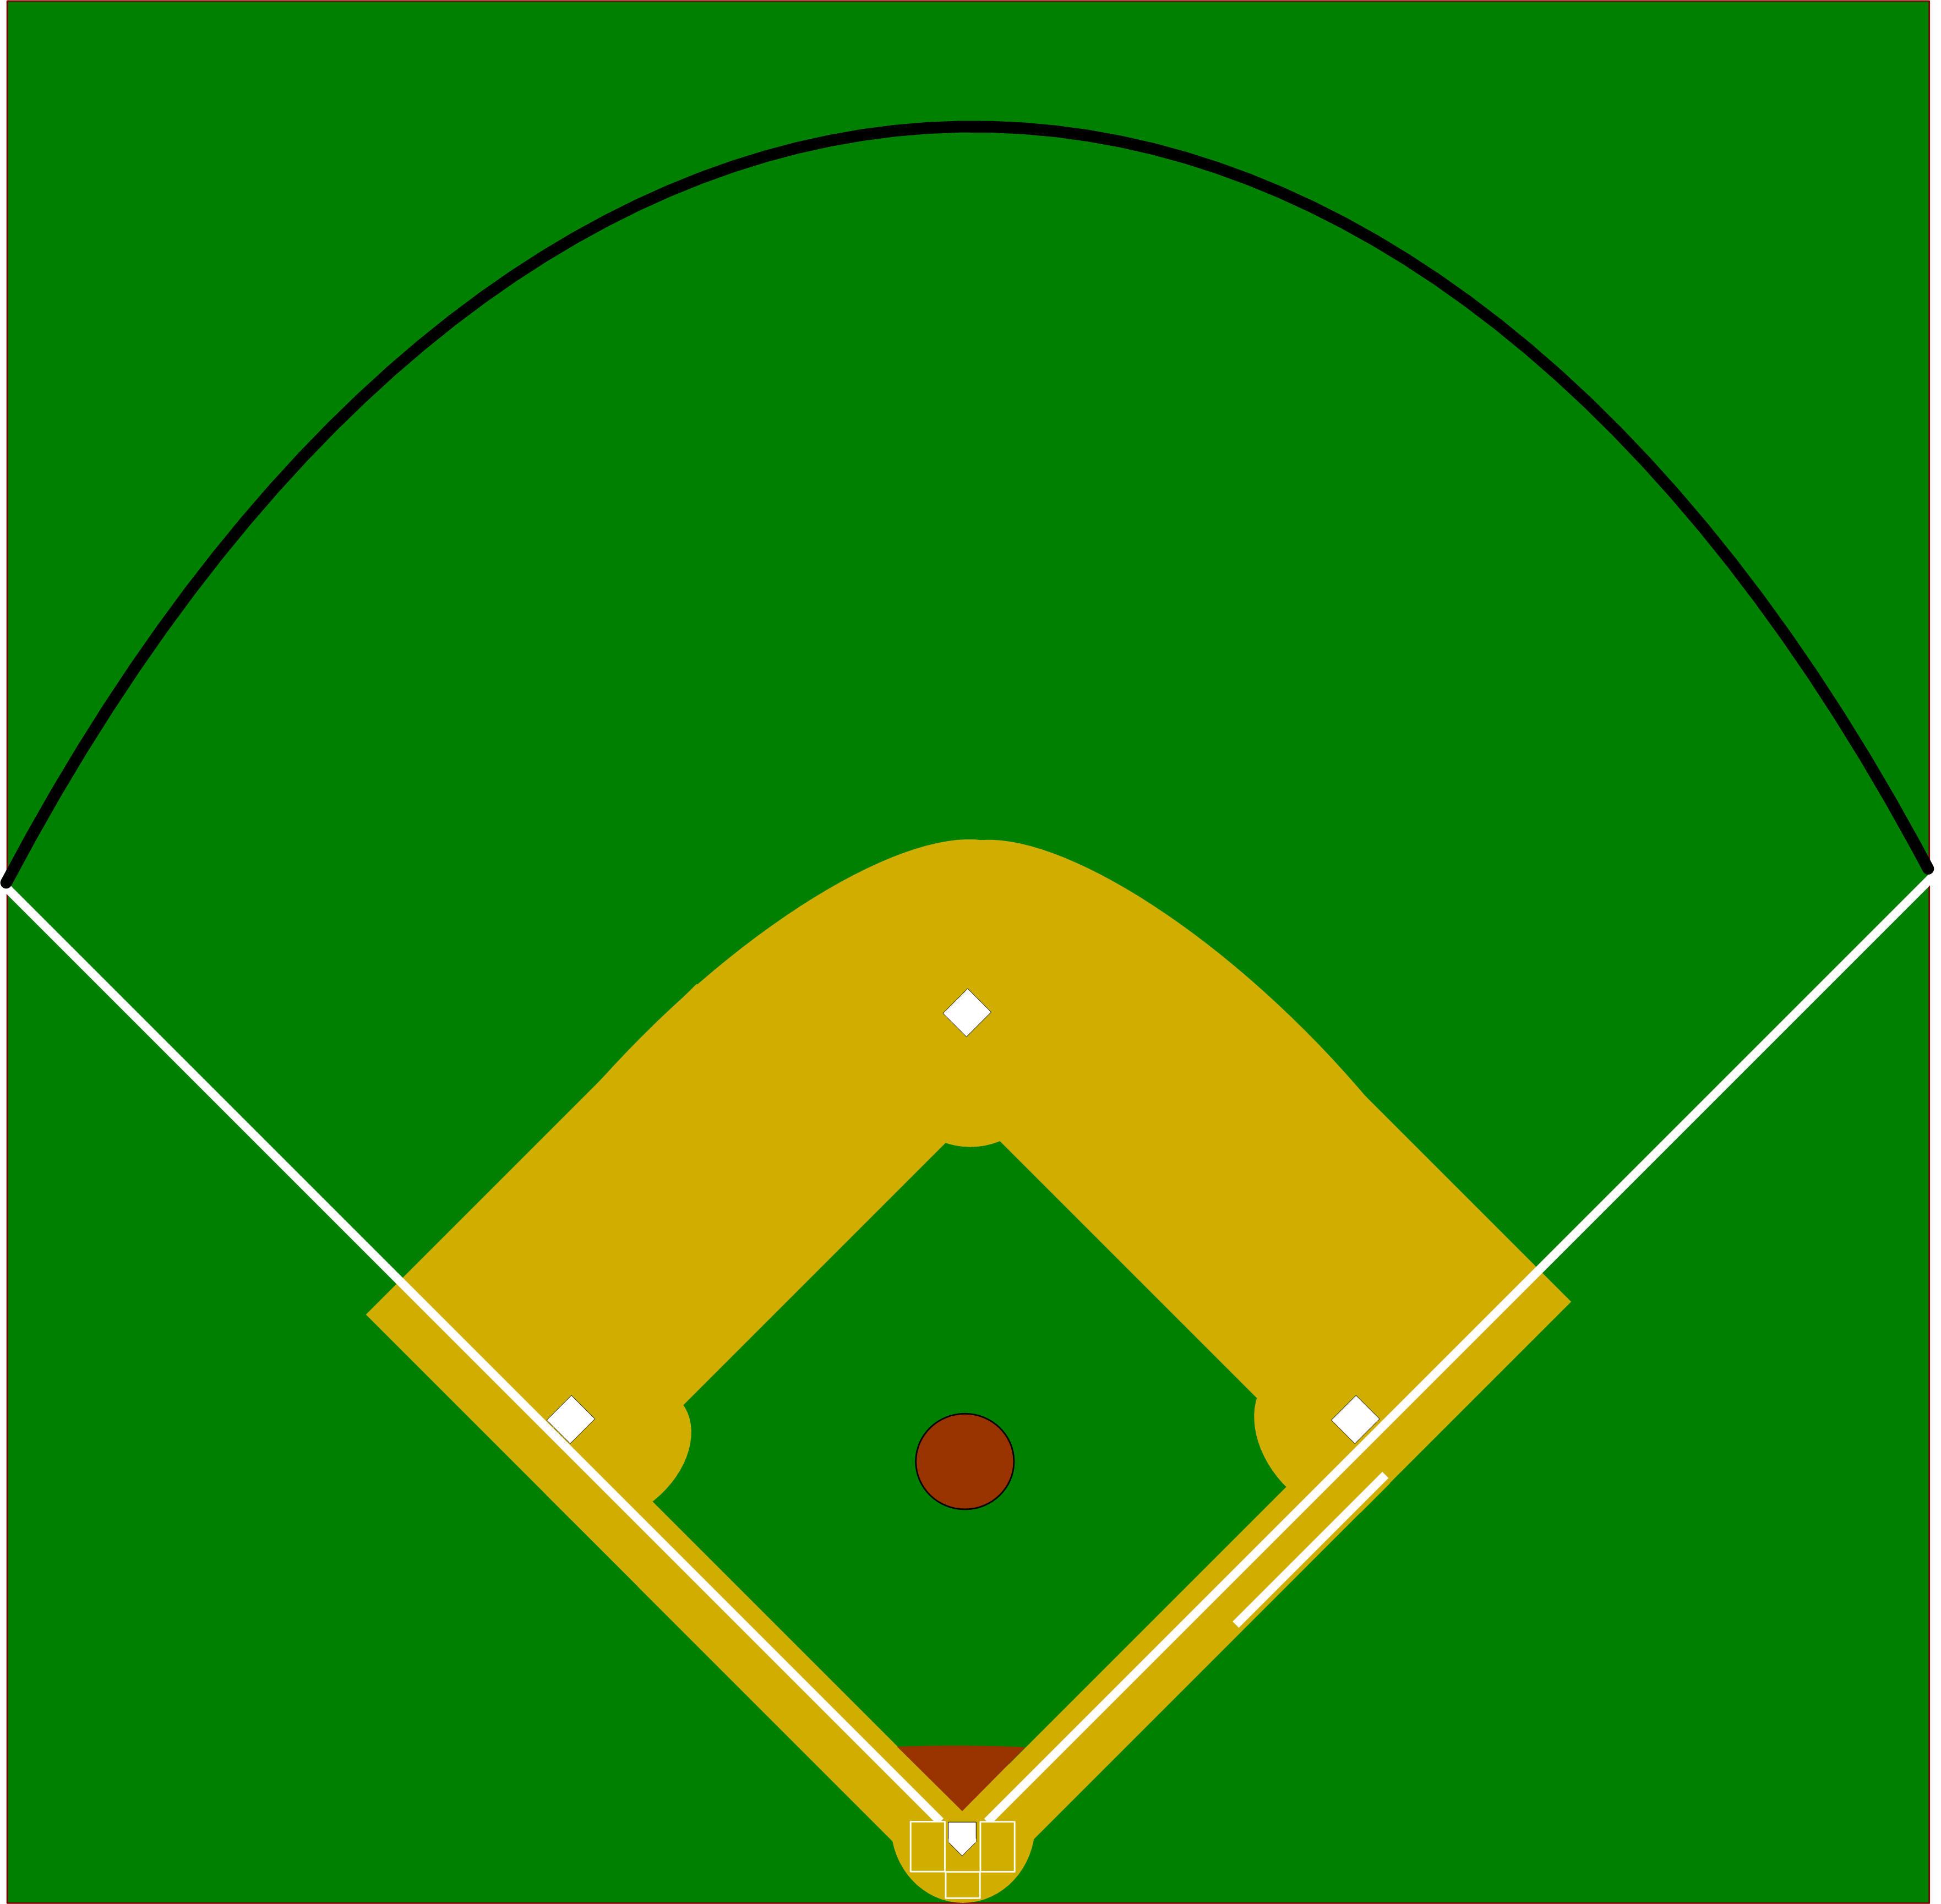 Baseball Field Vector at GetDrawings.com.